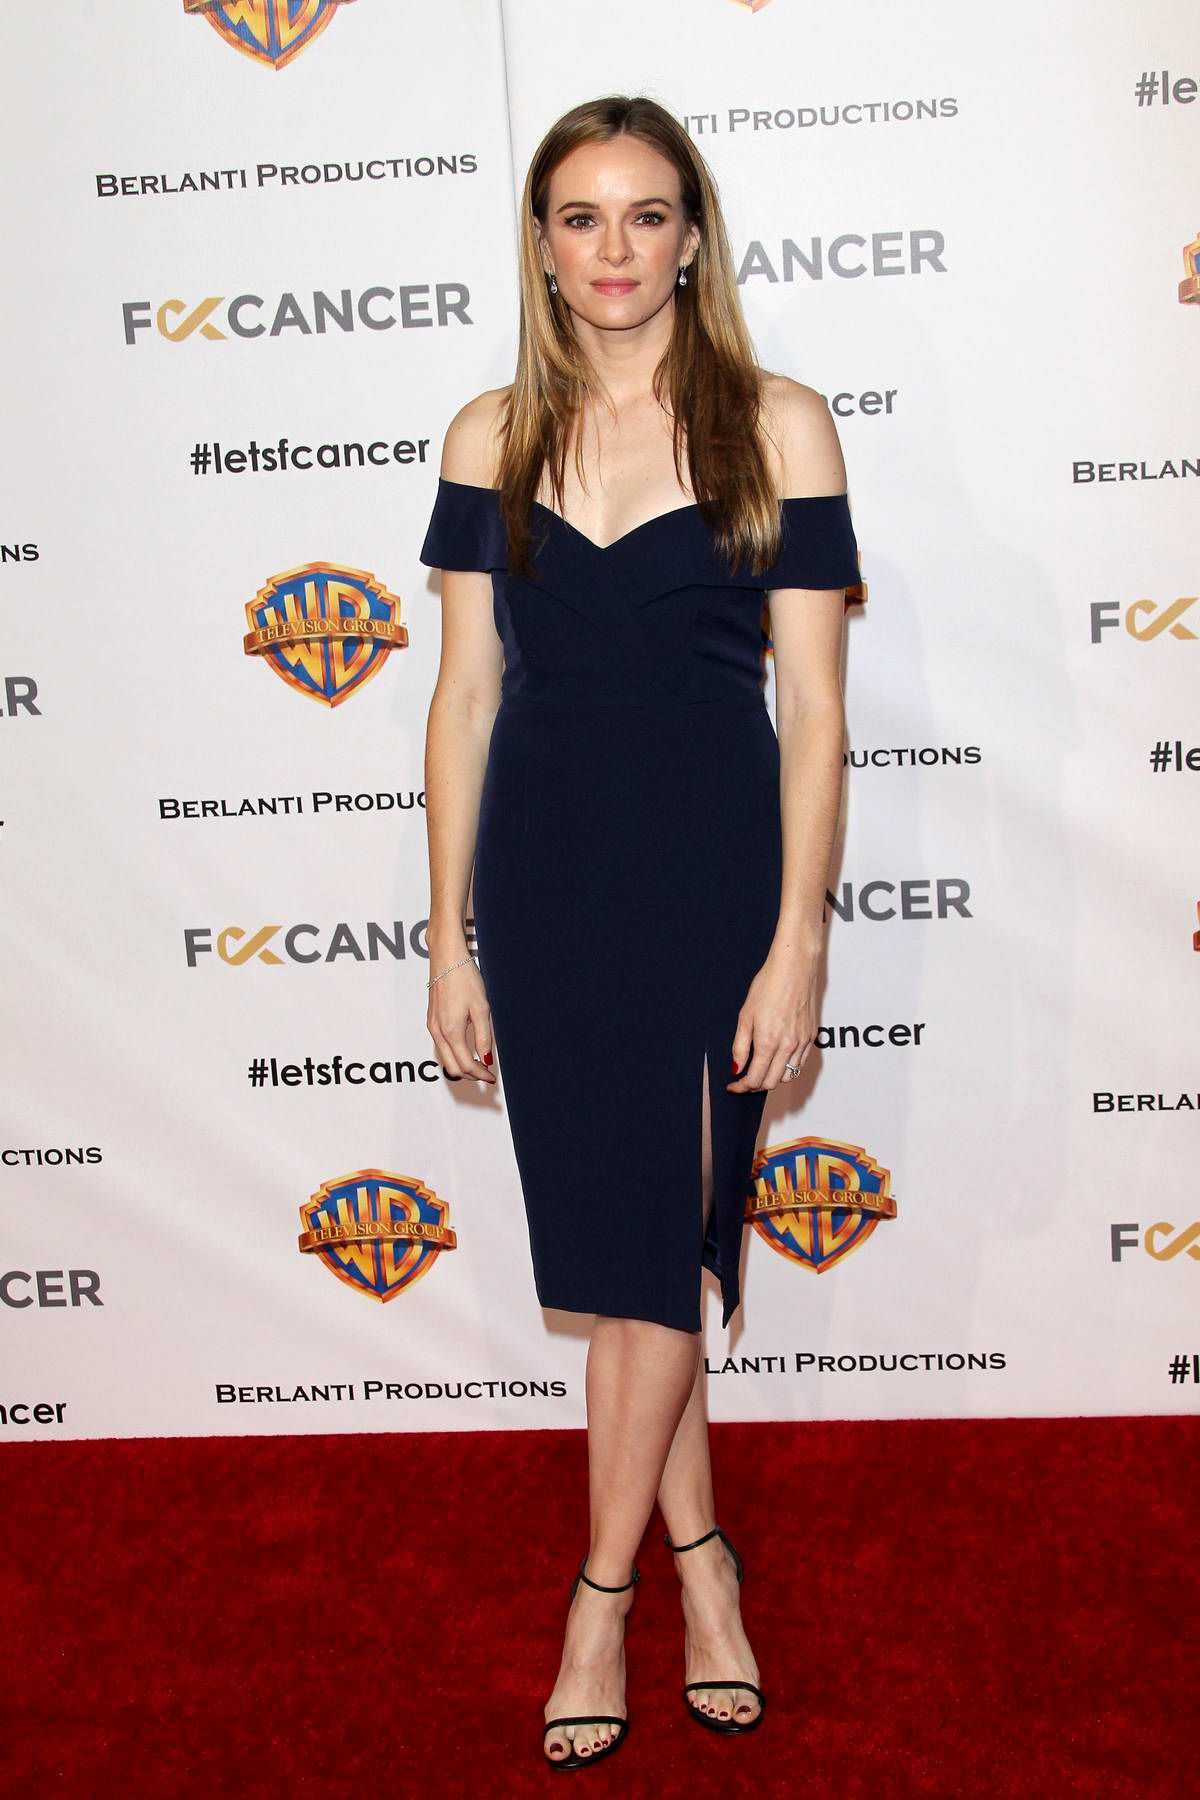 Danielle Panabaker attends Fck Cancer's 1st Annual Barbara Berlanti Heroes Gala in Burbank, California